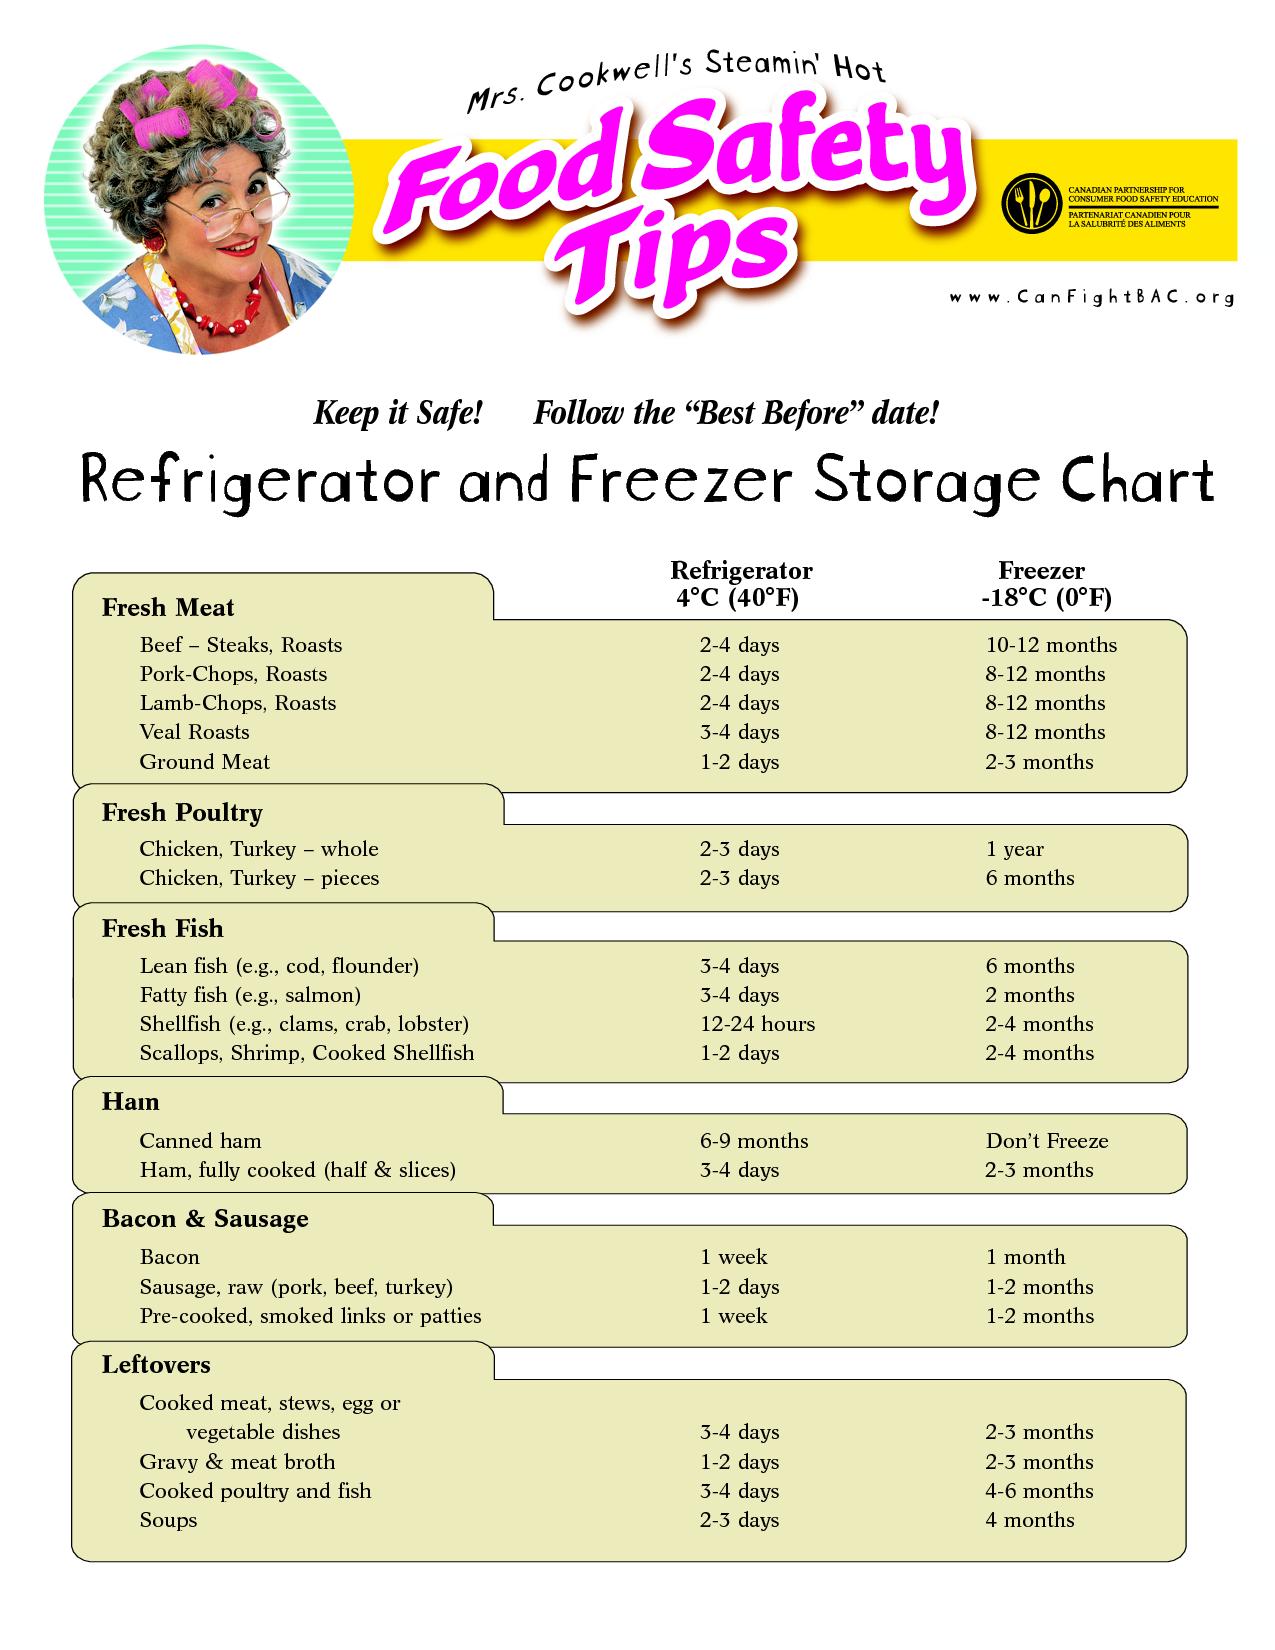 Meat Storage Chart